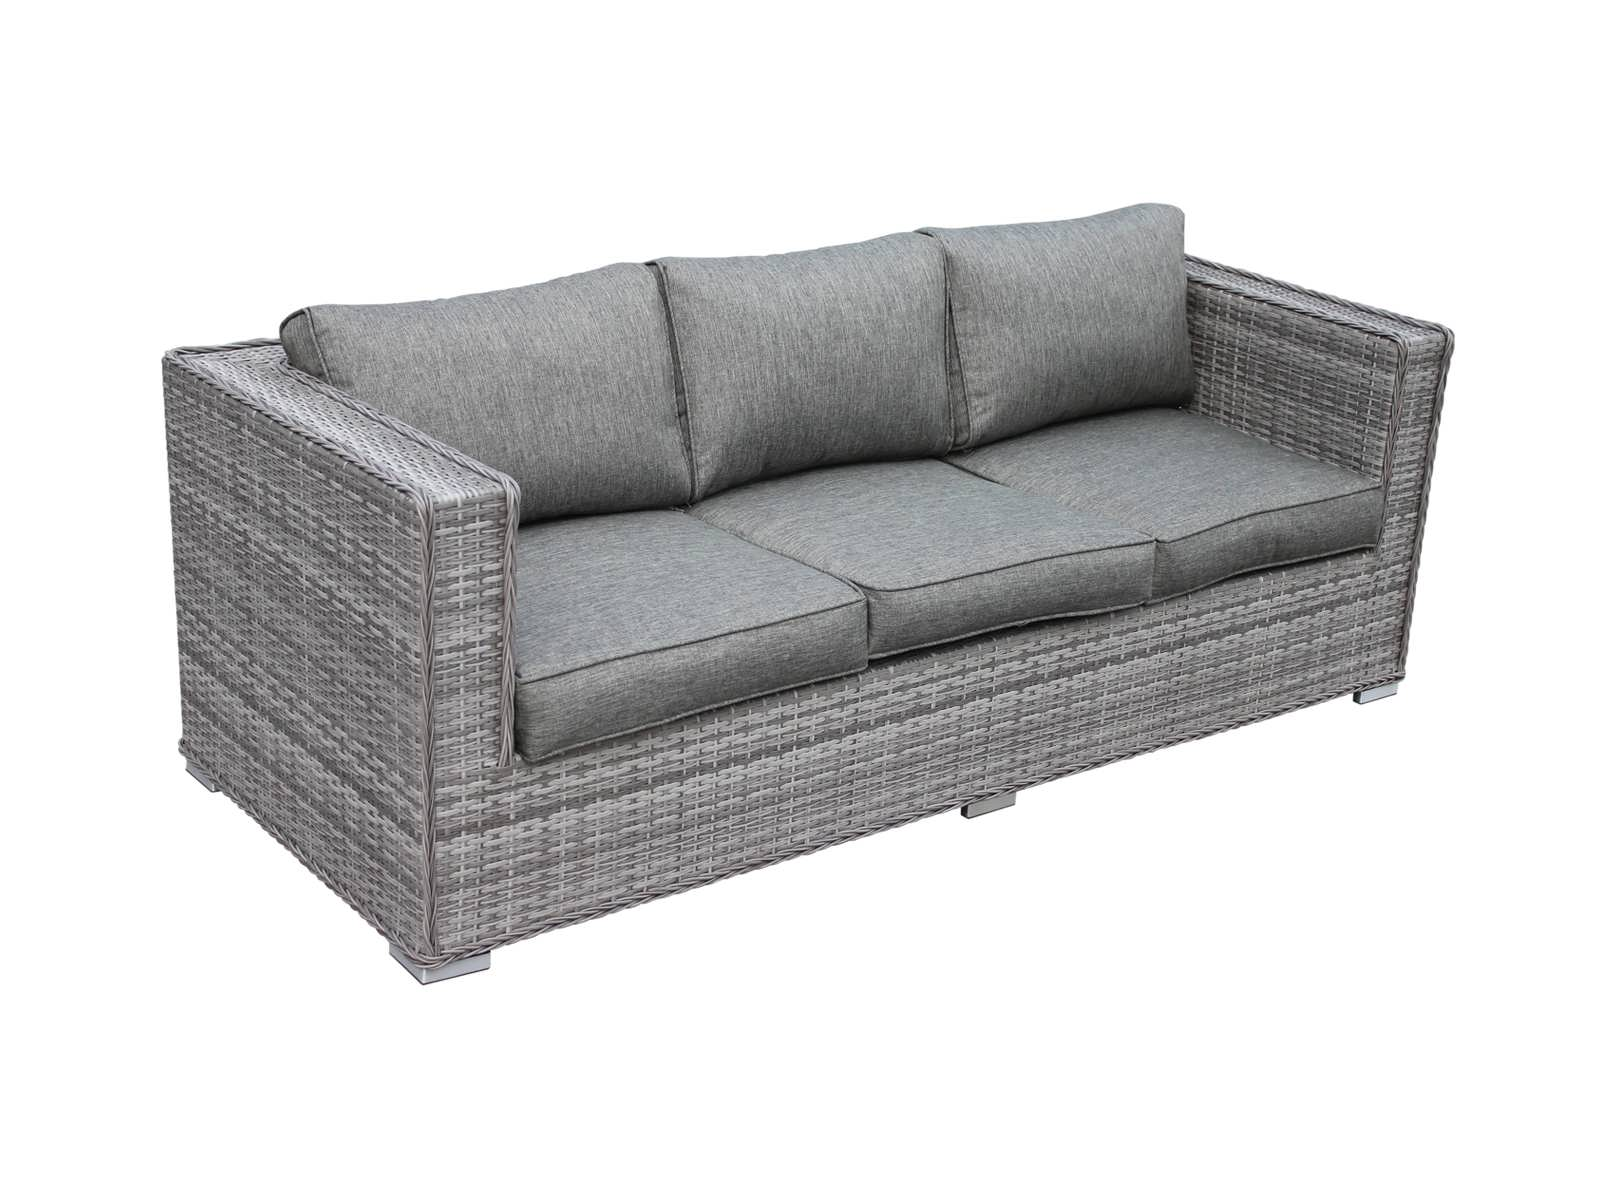 ascot 3 seat outdoor rattan sofa in grey OBULYNR